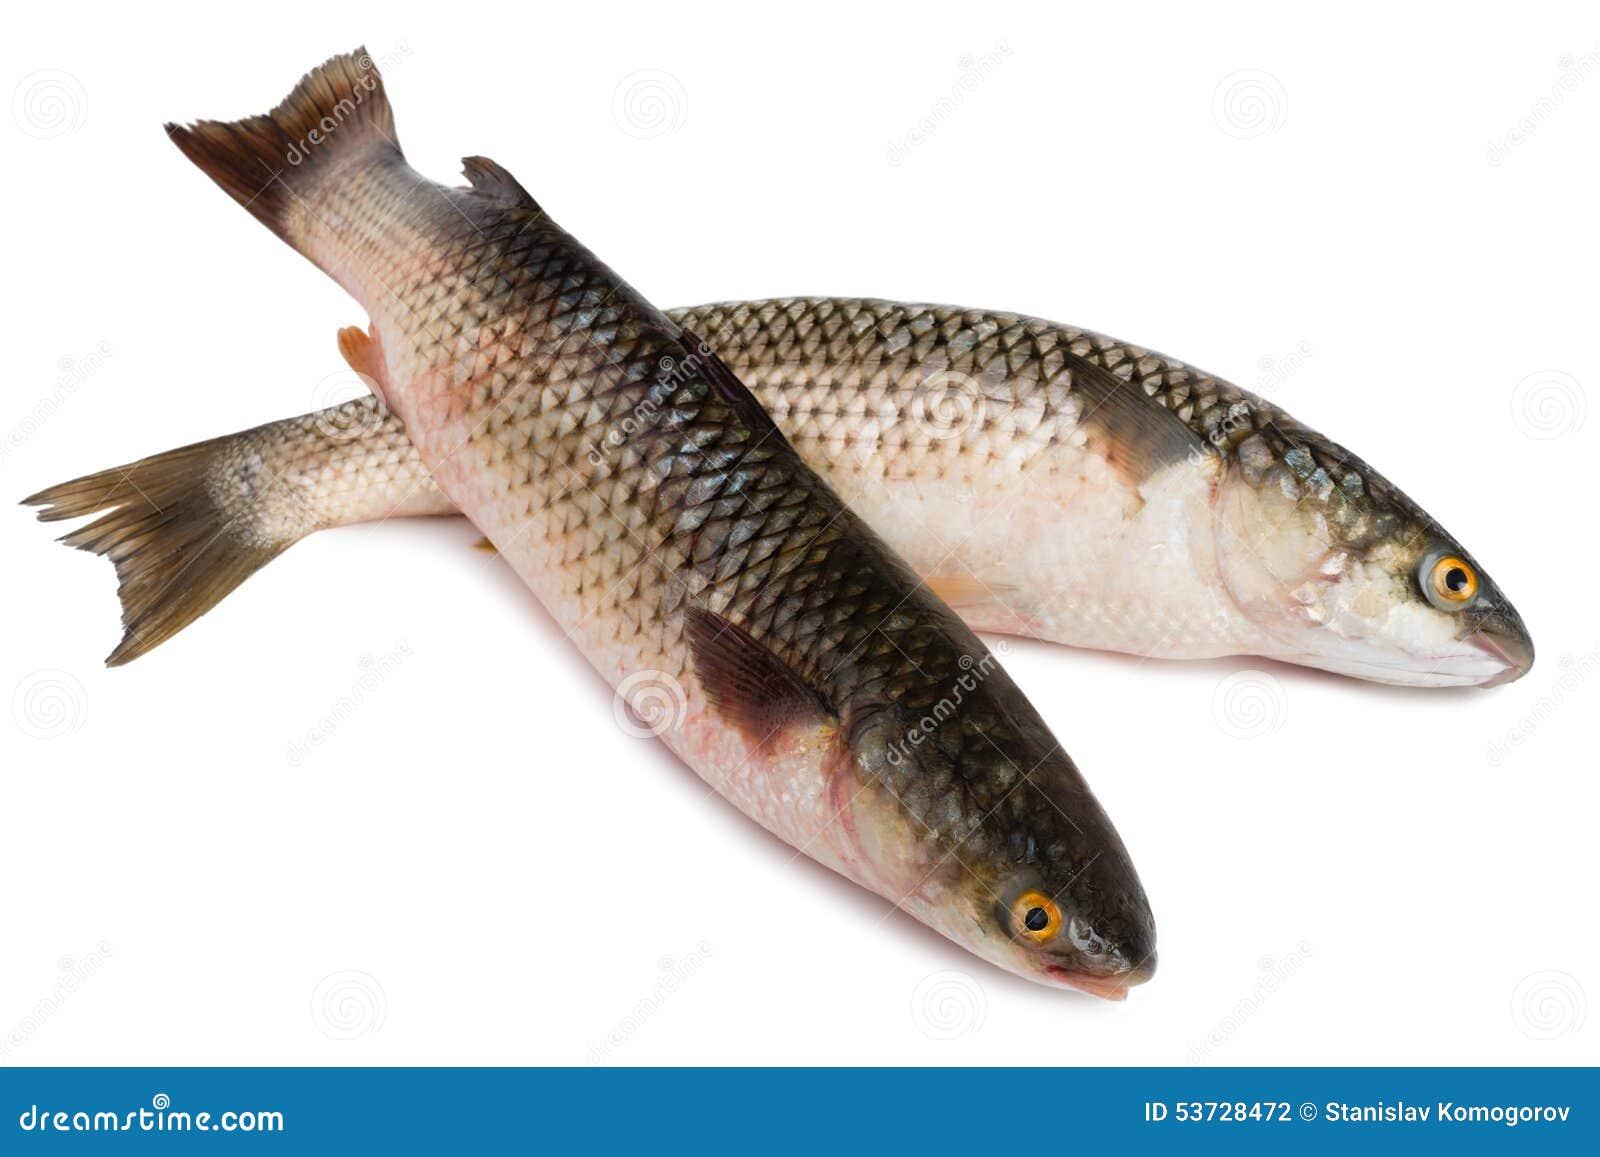 Info poisson de mer - Grand poisson de mer ...